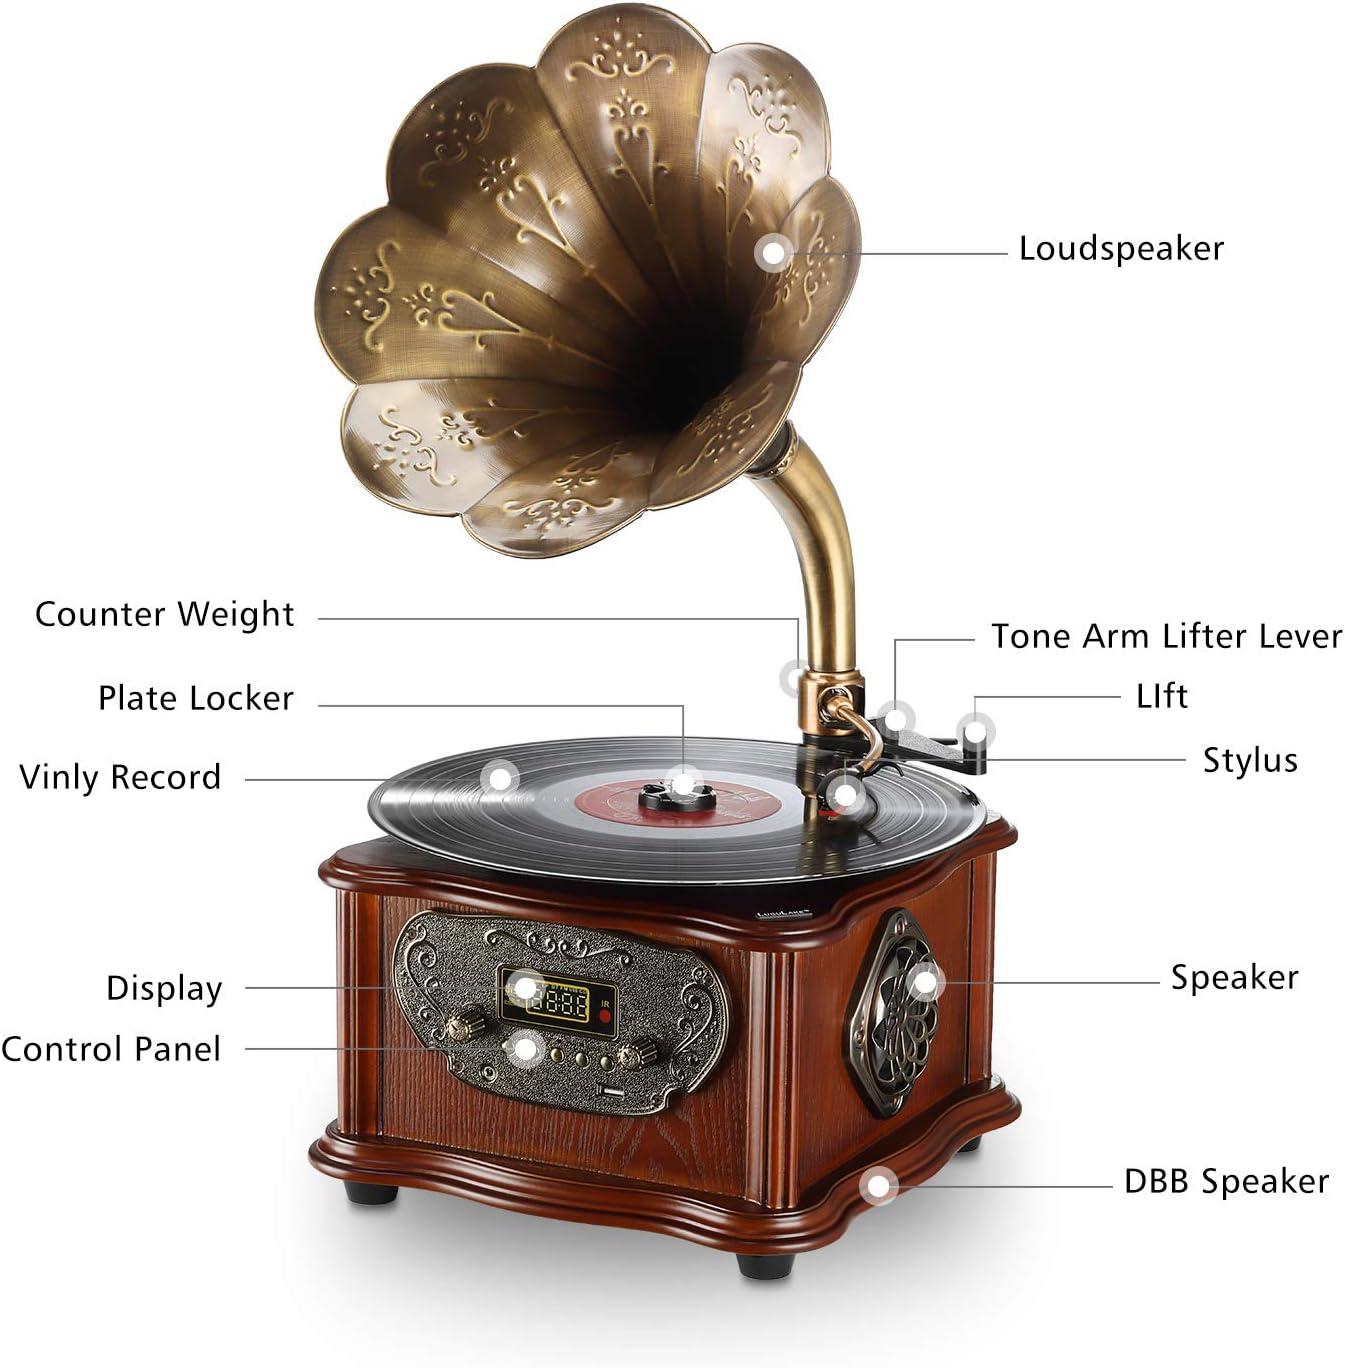 Amazon.com: LuguLake - Reproductor de grabación, Bluetooth ...